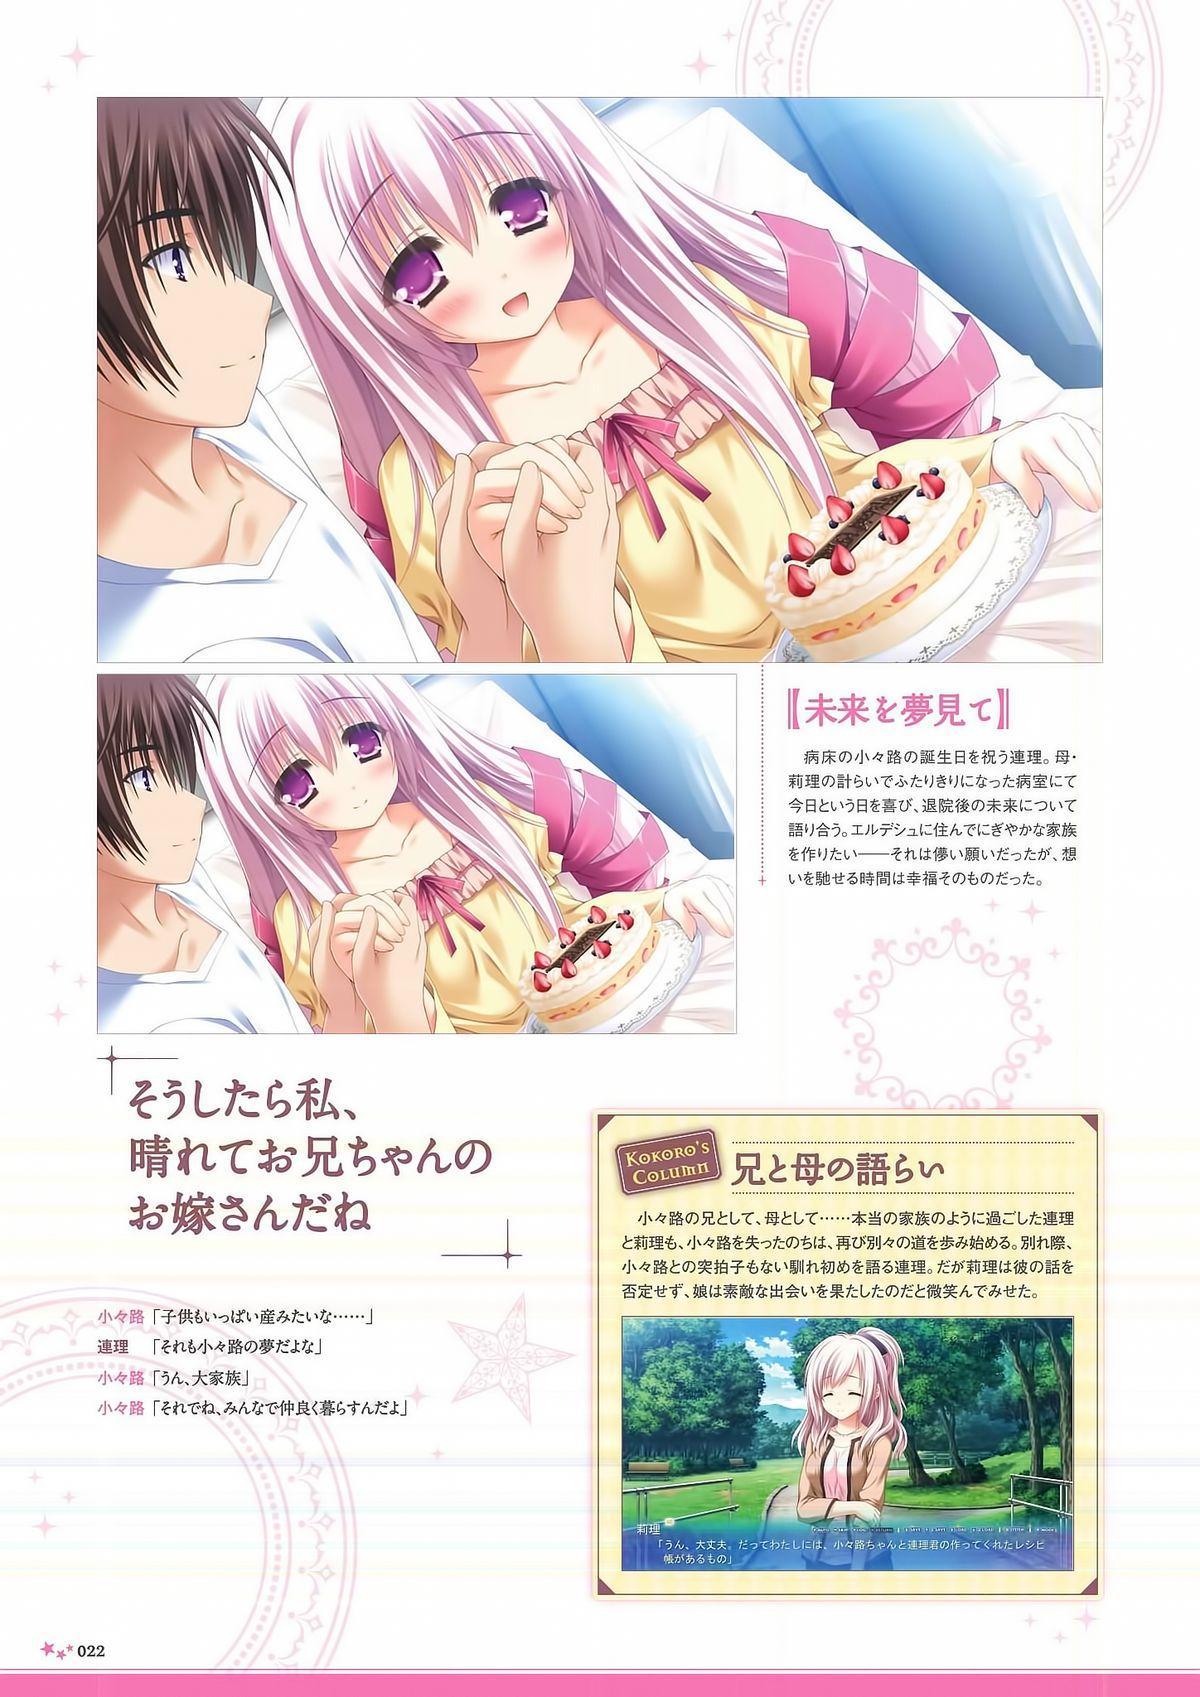 Sekai to Sekai no Mannaka de Visual Fanbook 23